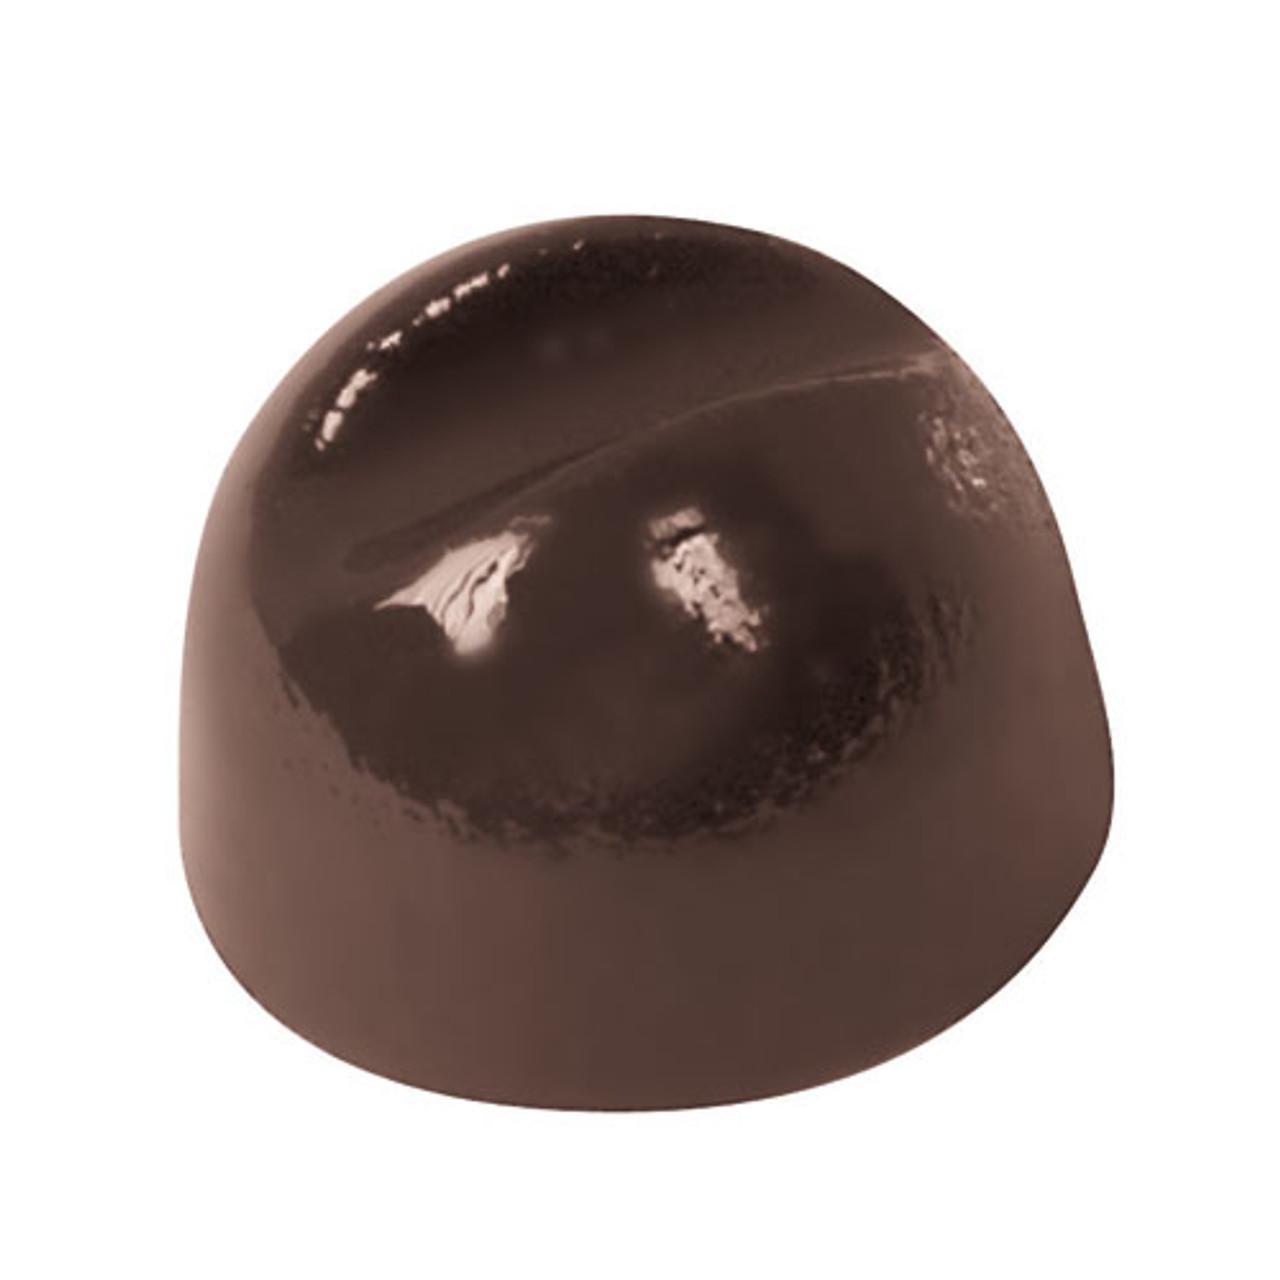 "Chocolate Mold, DIA 1"" X H 43/64"""